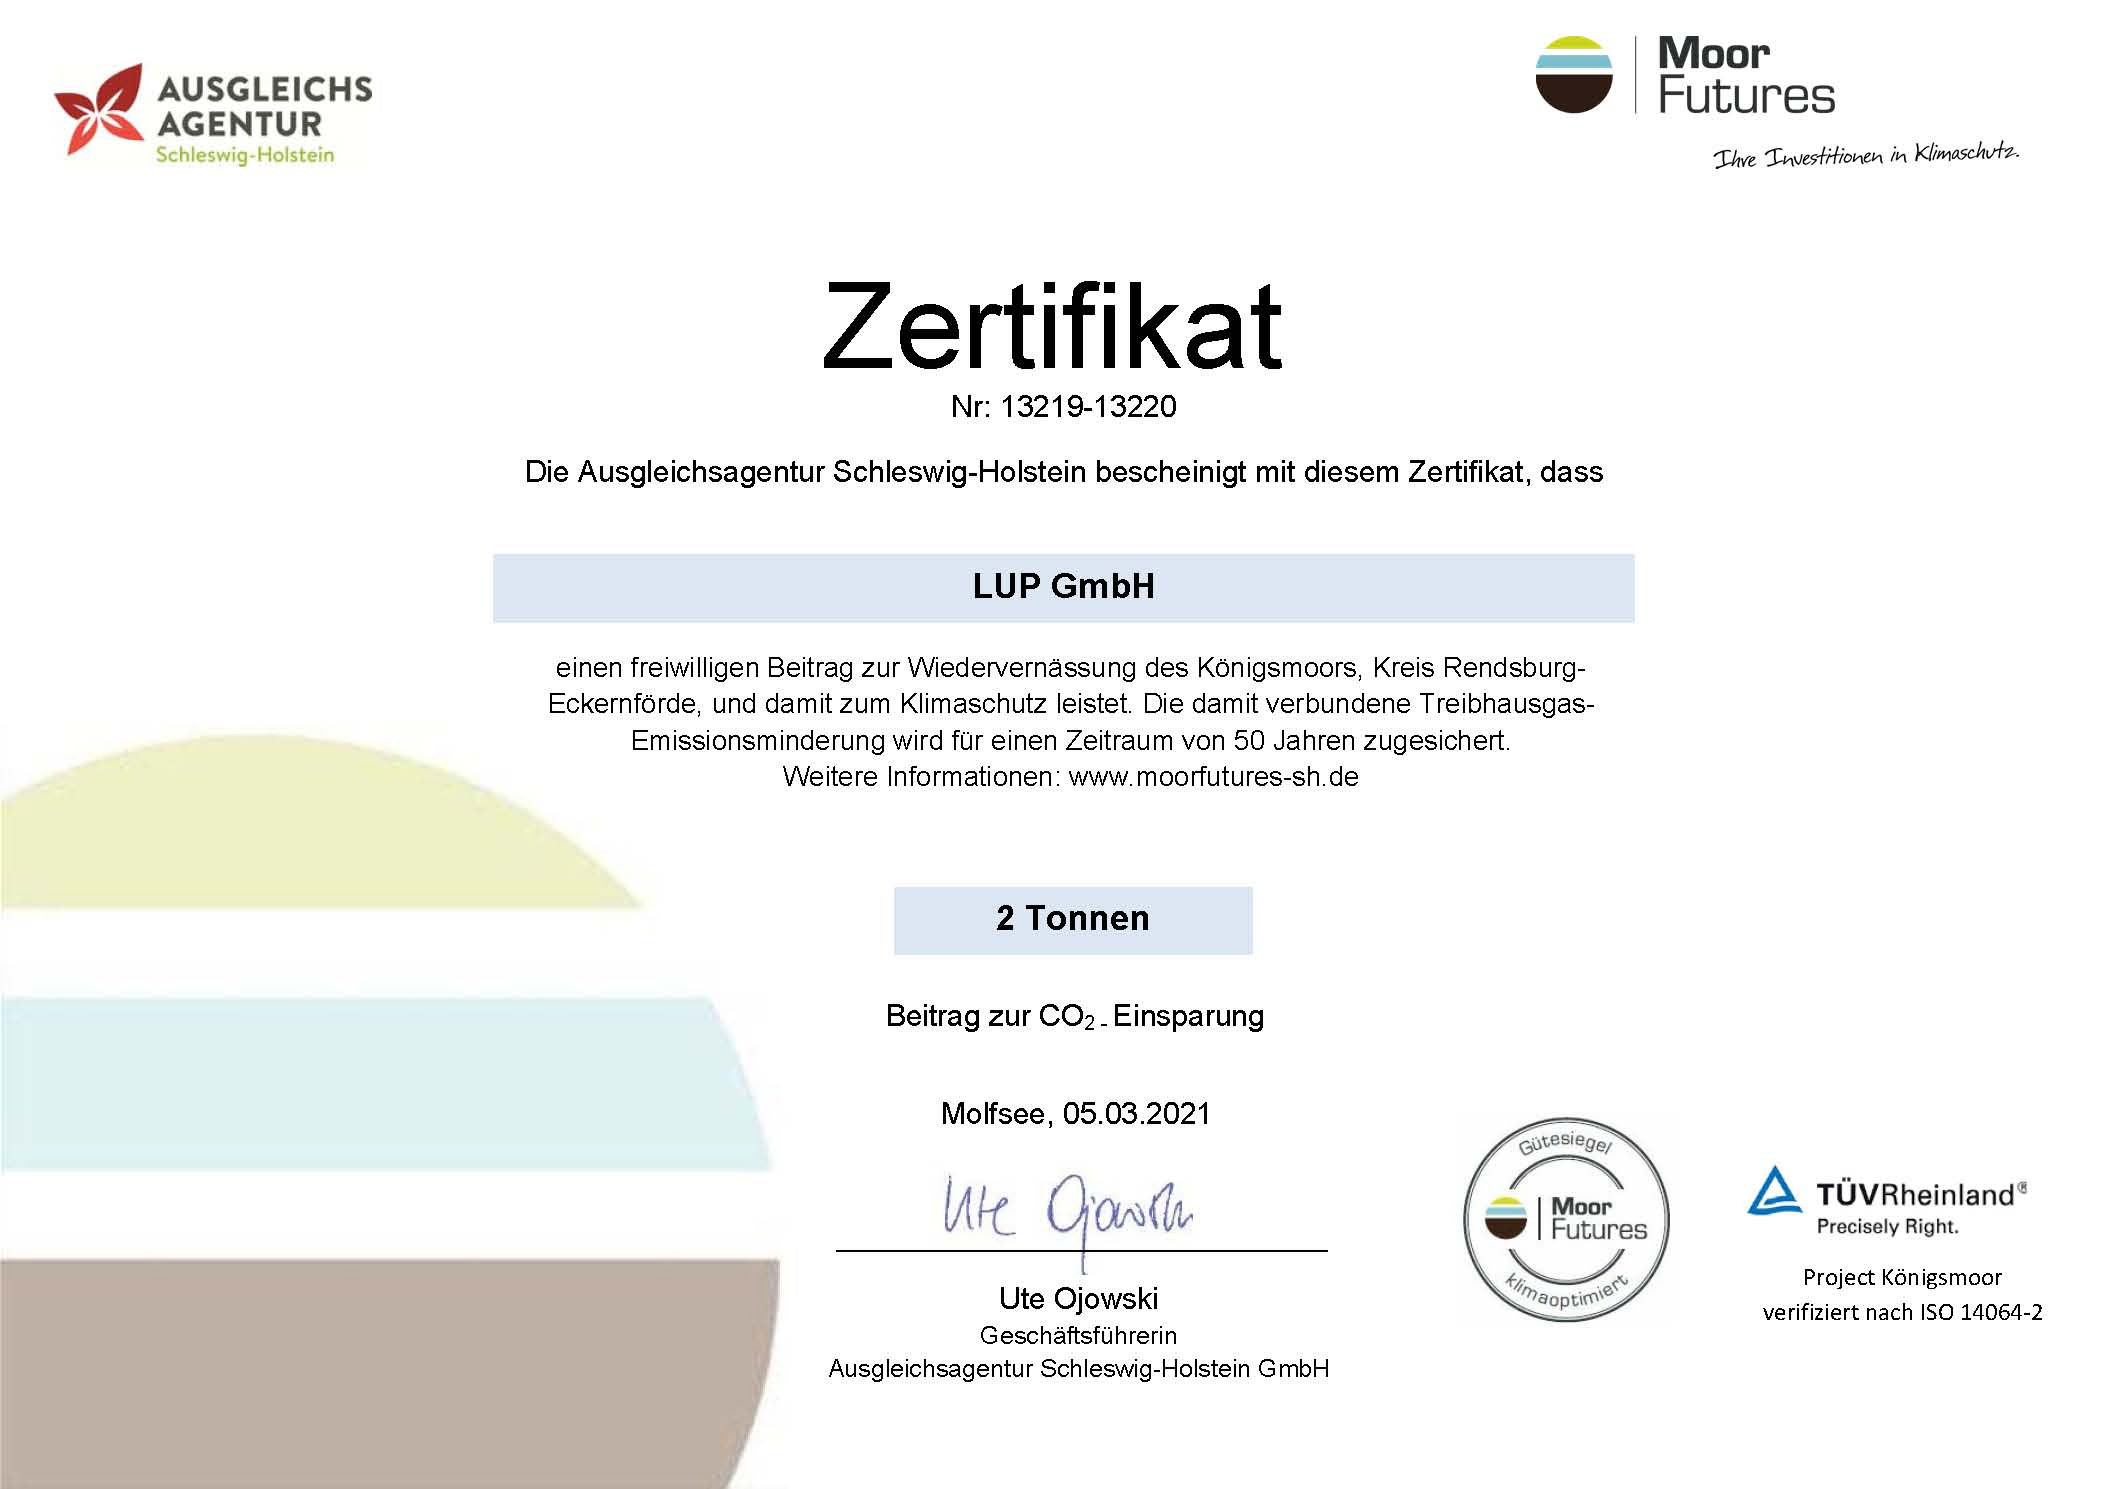 Zertifikat Wiedervernässung Königsmoor LUP GmbH